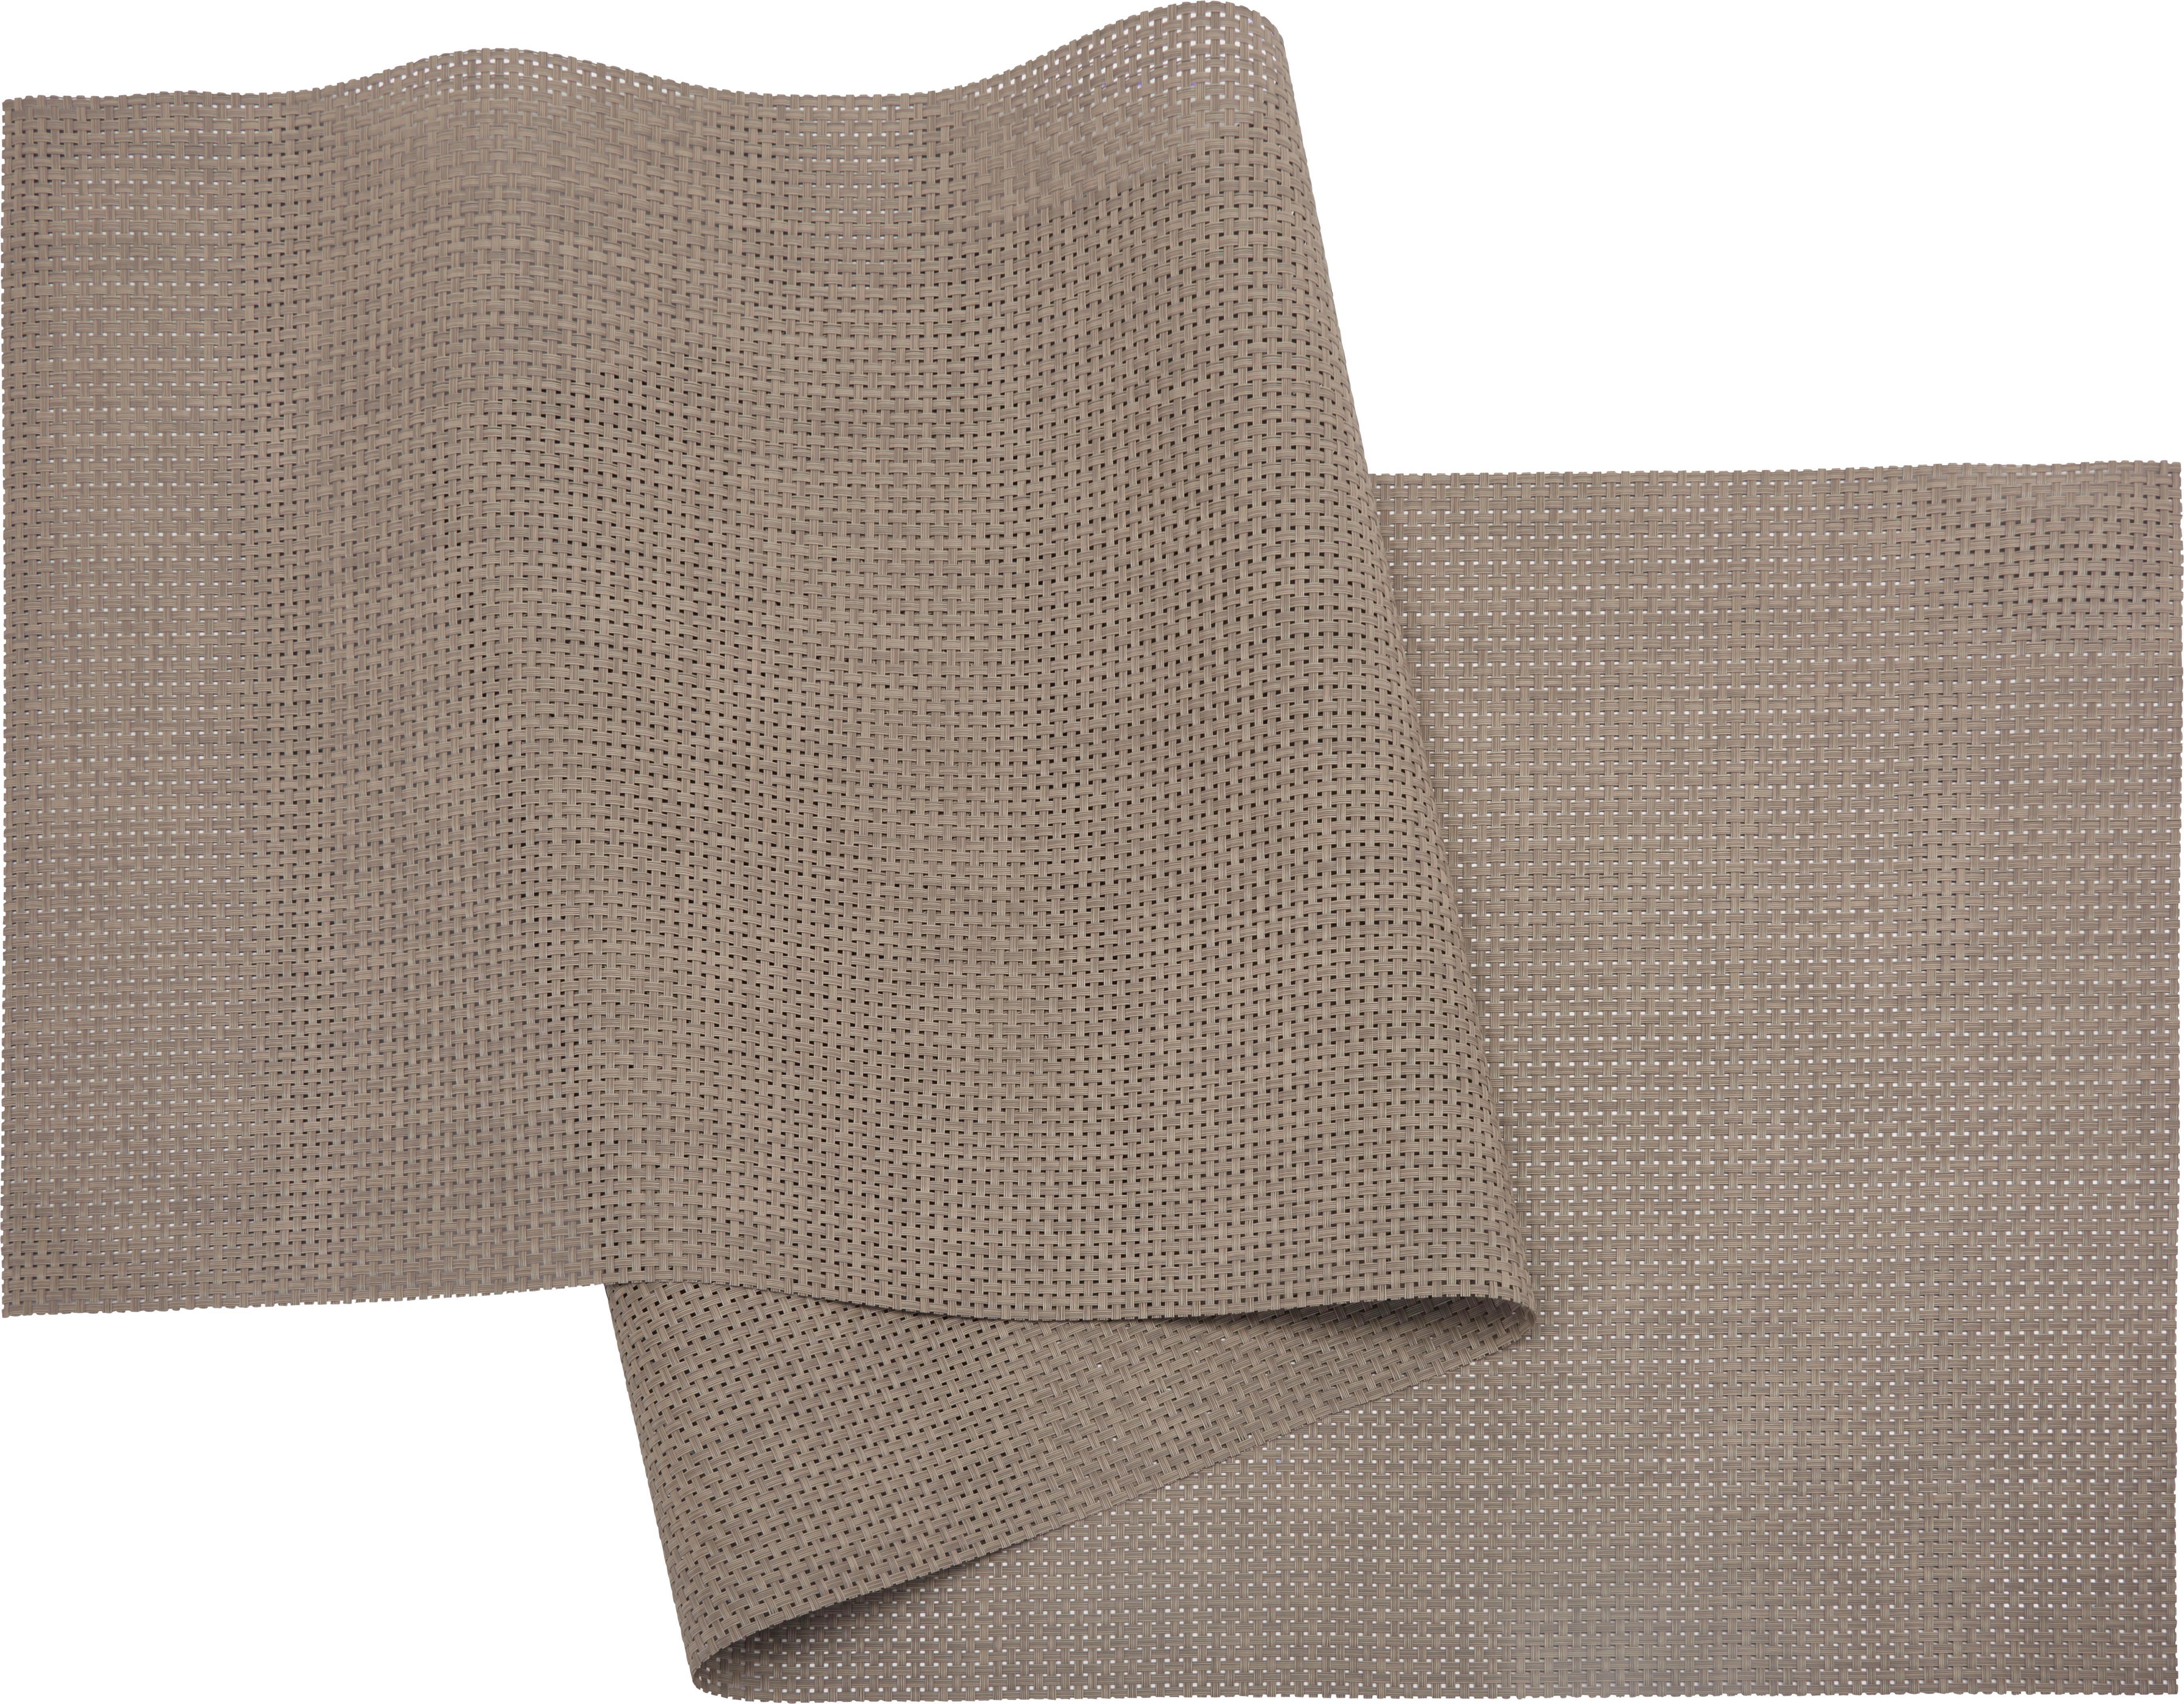 Nadprt Stefan - sivo rjava, umetna masa (45/150cm) - MÖMAX modern living